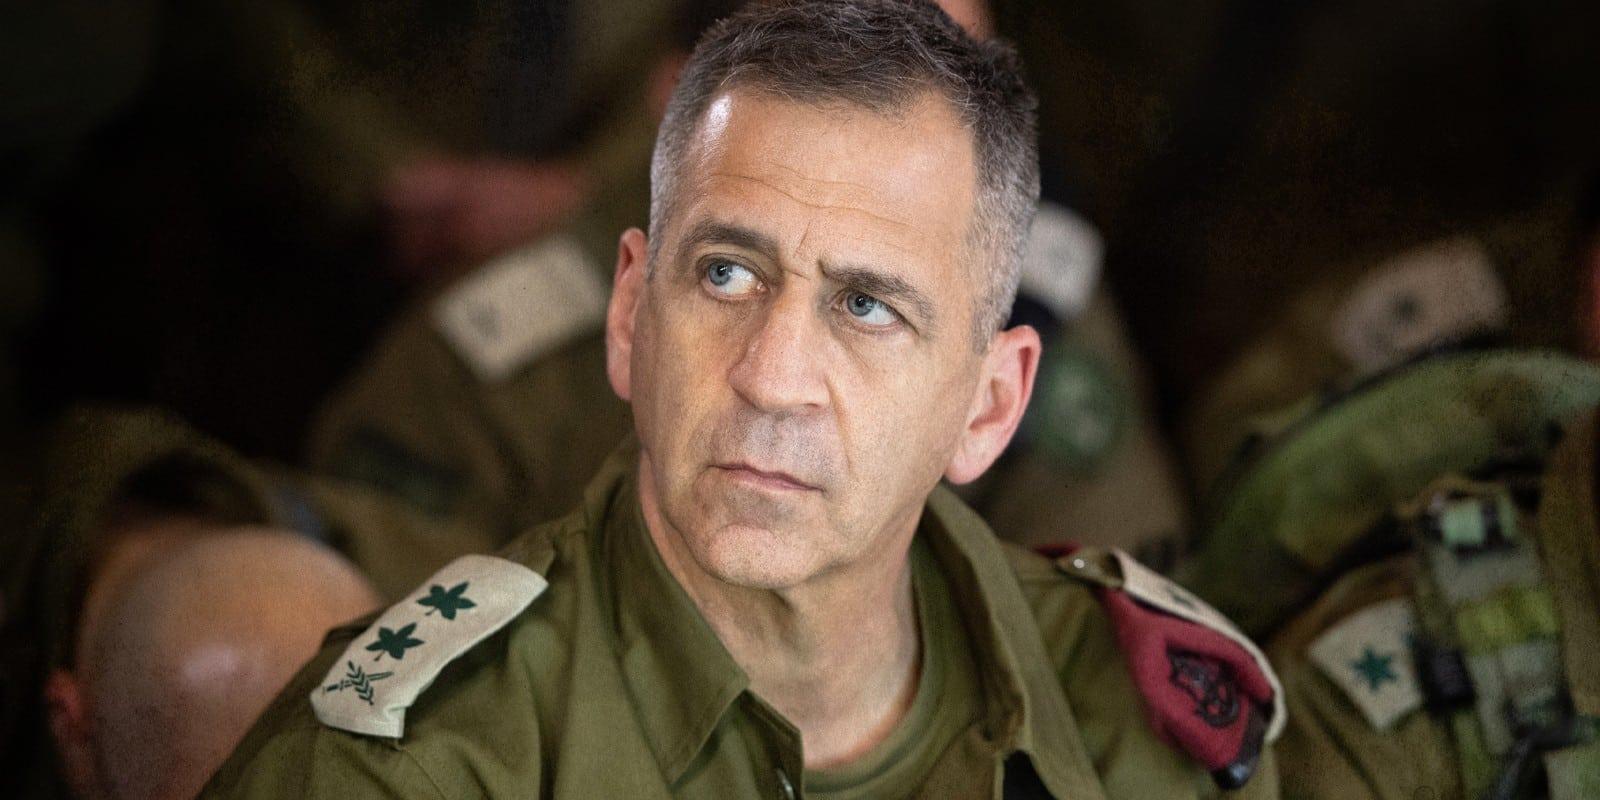 Aviv Kochavi Chief of General Staff of the IDF, in uniform